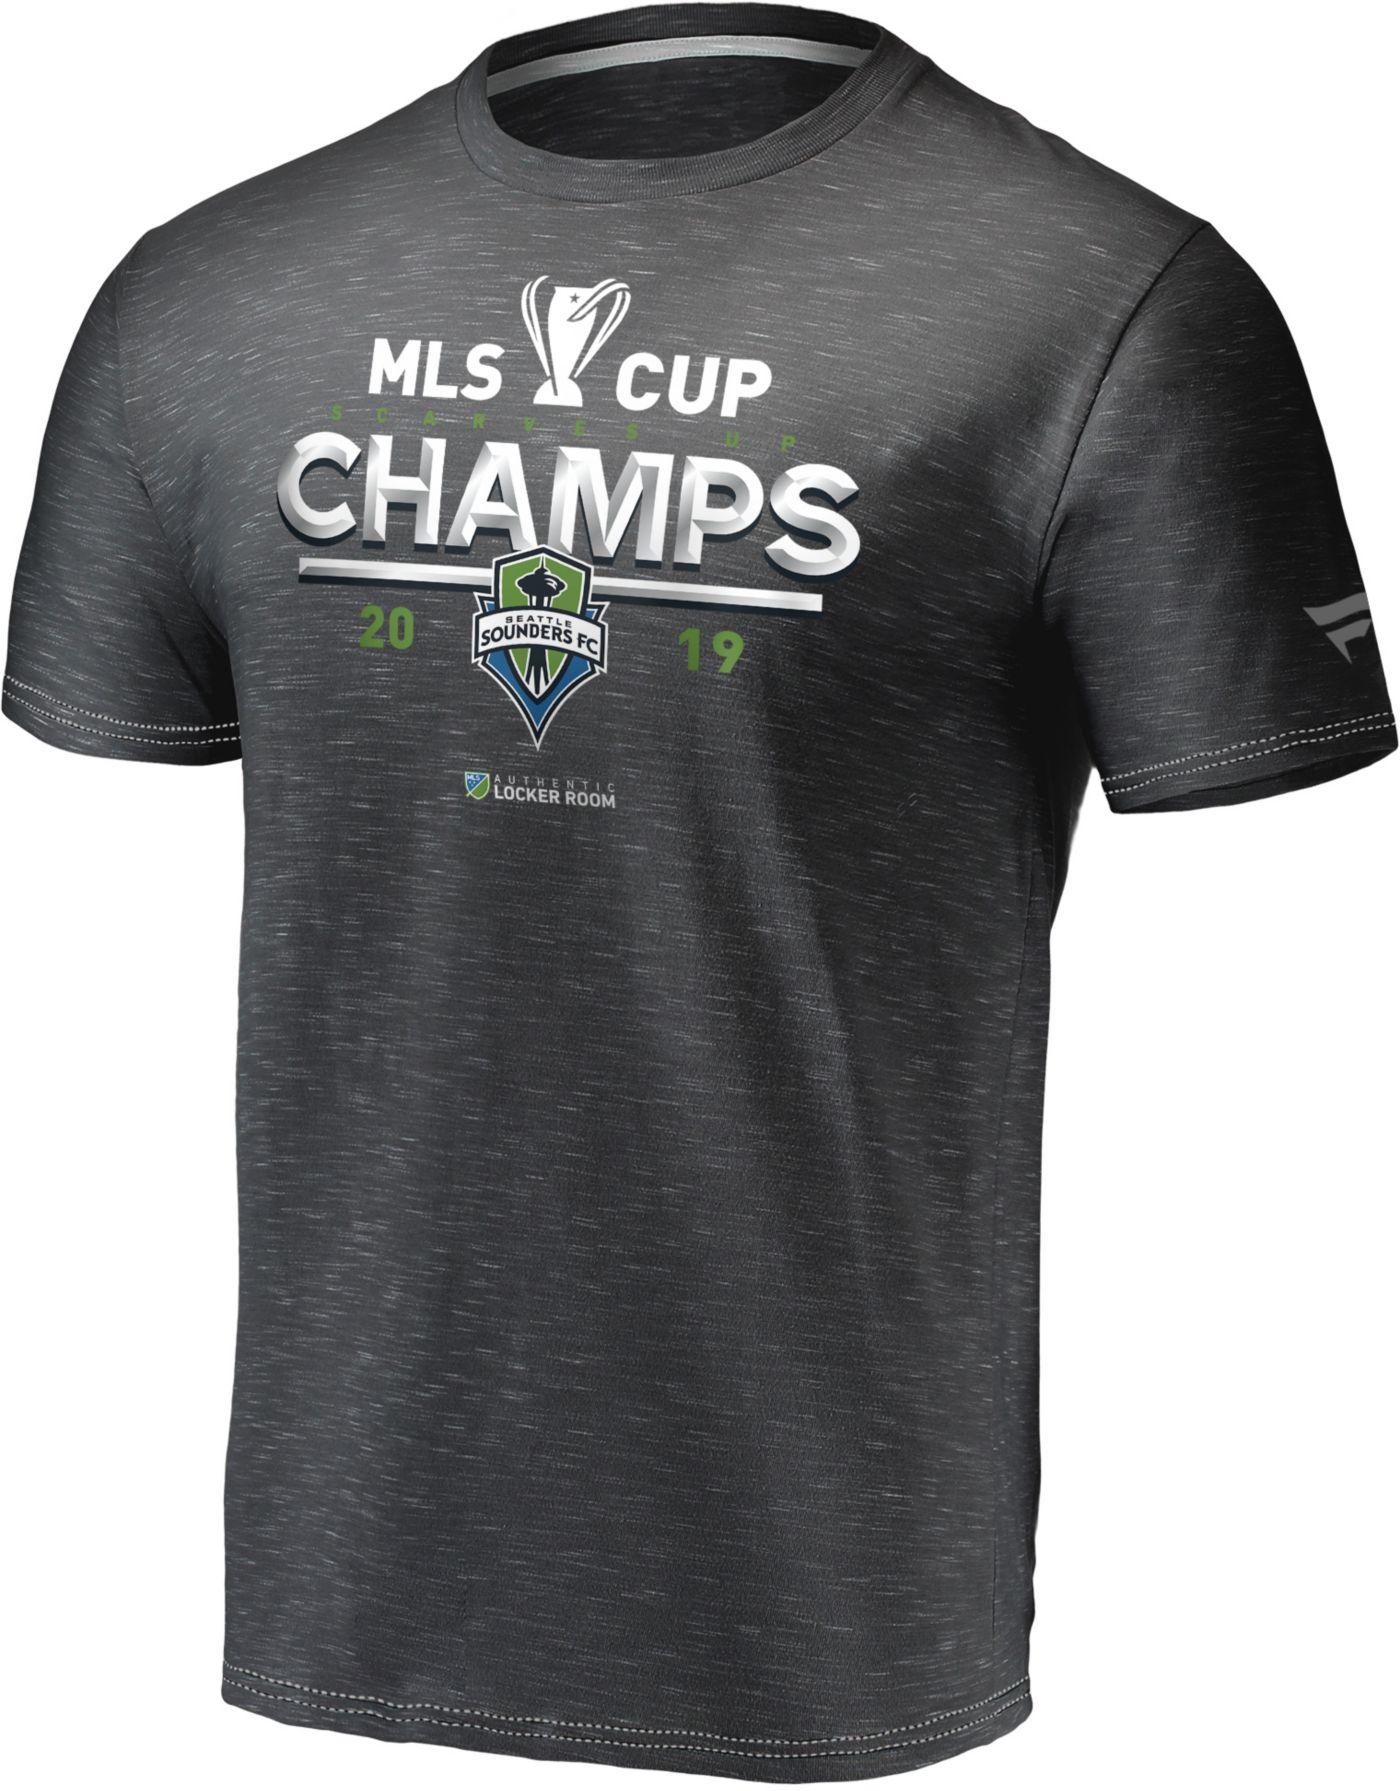 MLS Men's 2019 MLS Cup Champions Seattle Sounders Locker Room T-Shirt